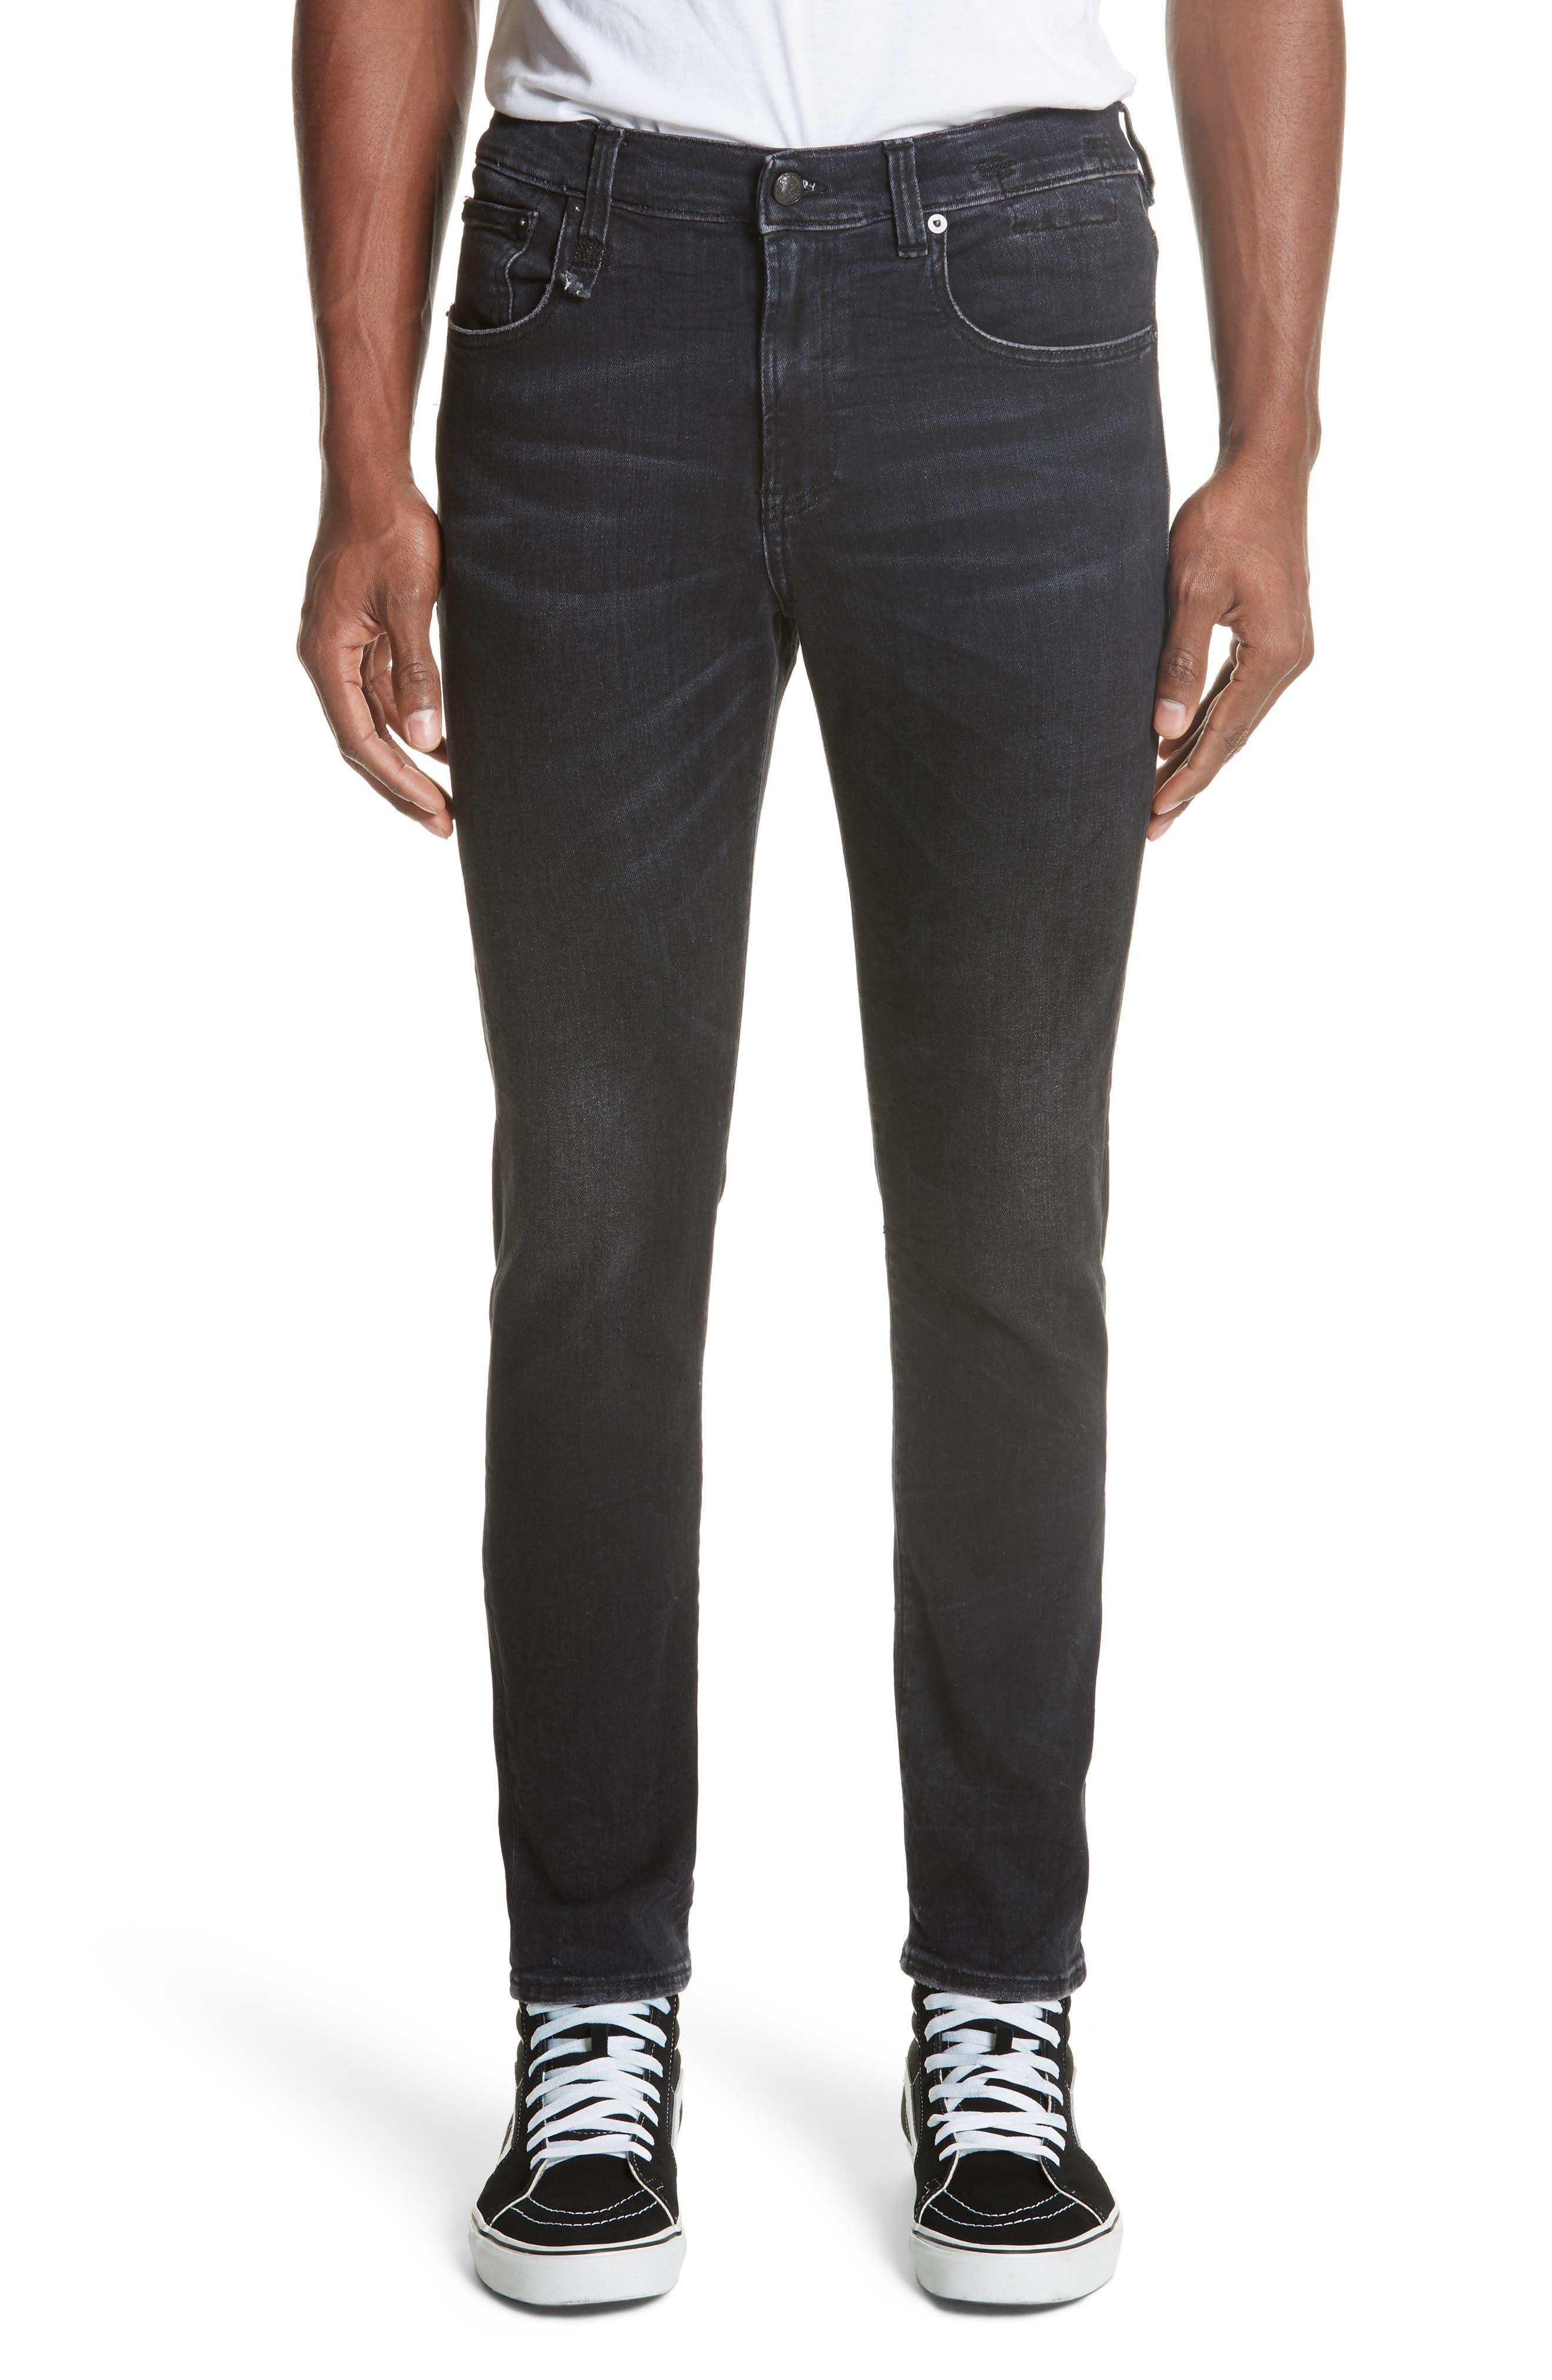 Skate Jeans,                             Main thumbnail 1, color,                             BLACK MARBLE